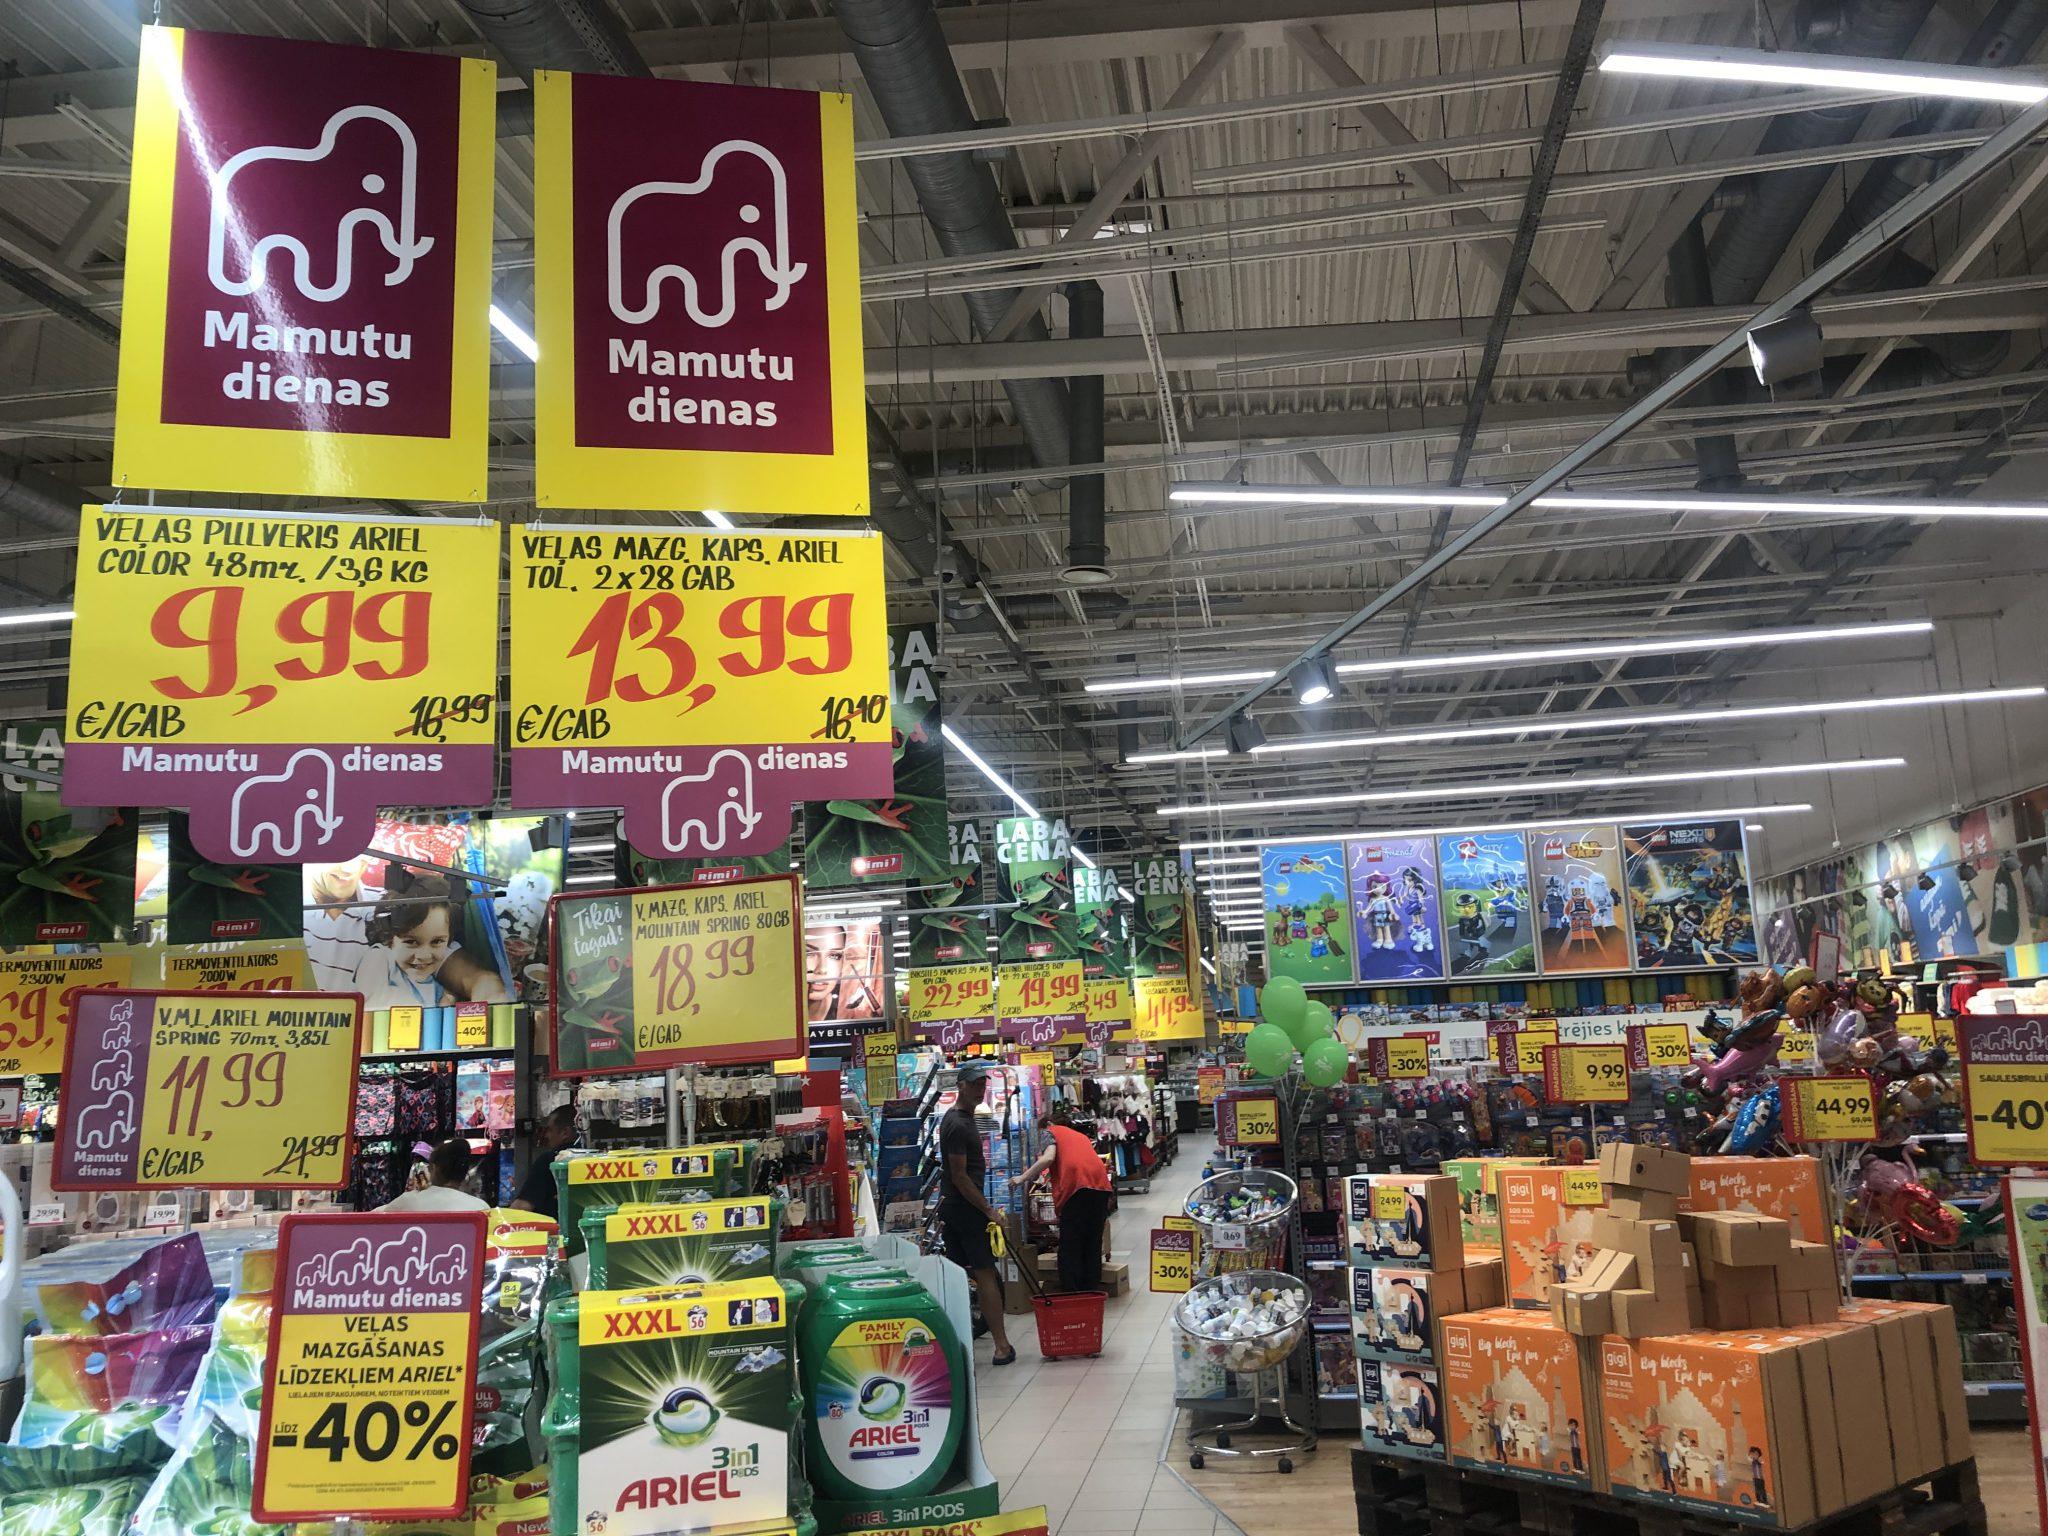 Mamutu dienas im Rimi Supermarkt in Lettland